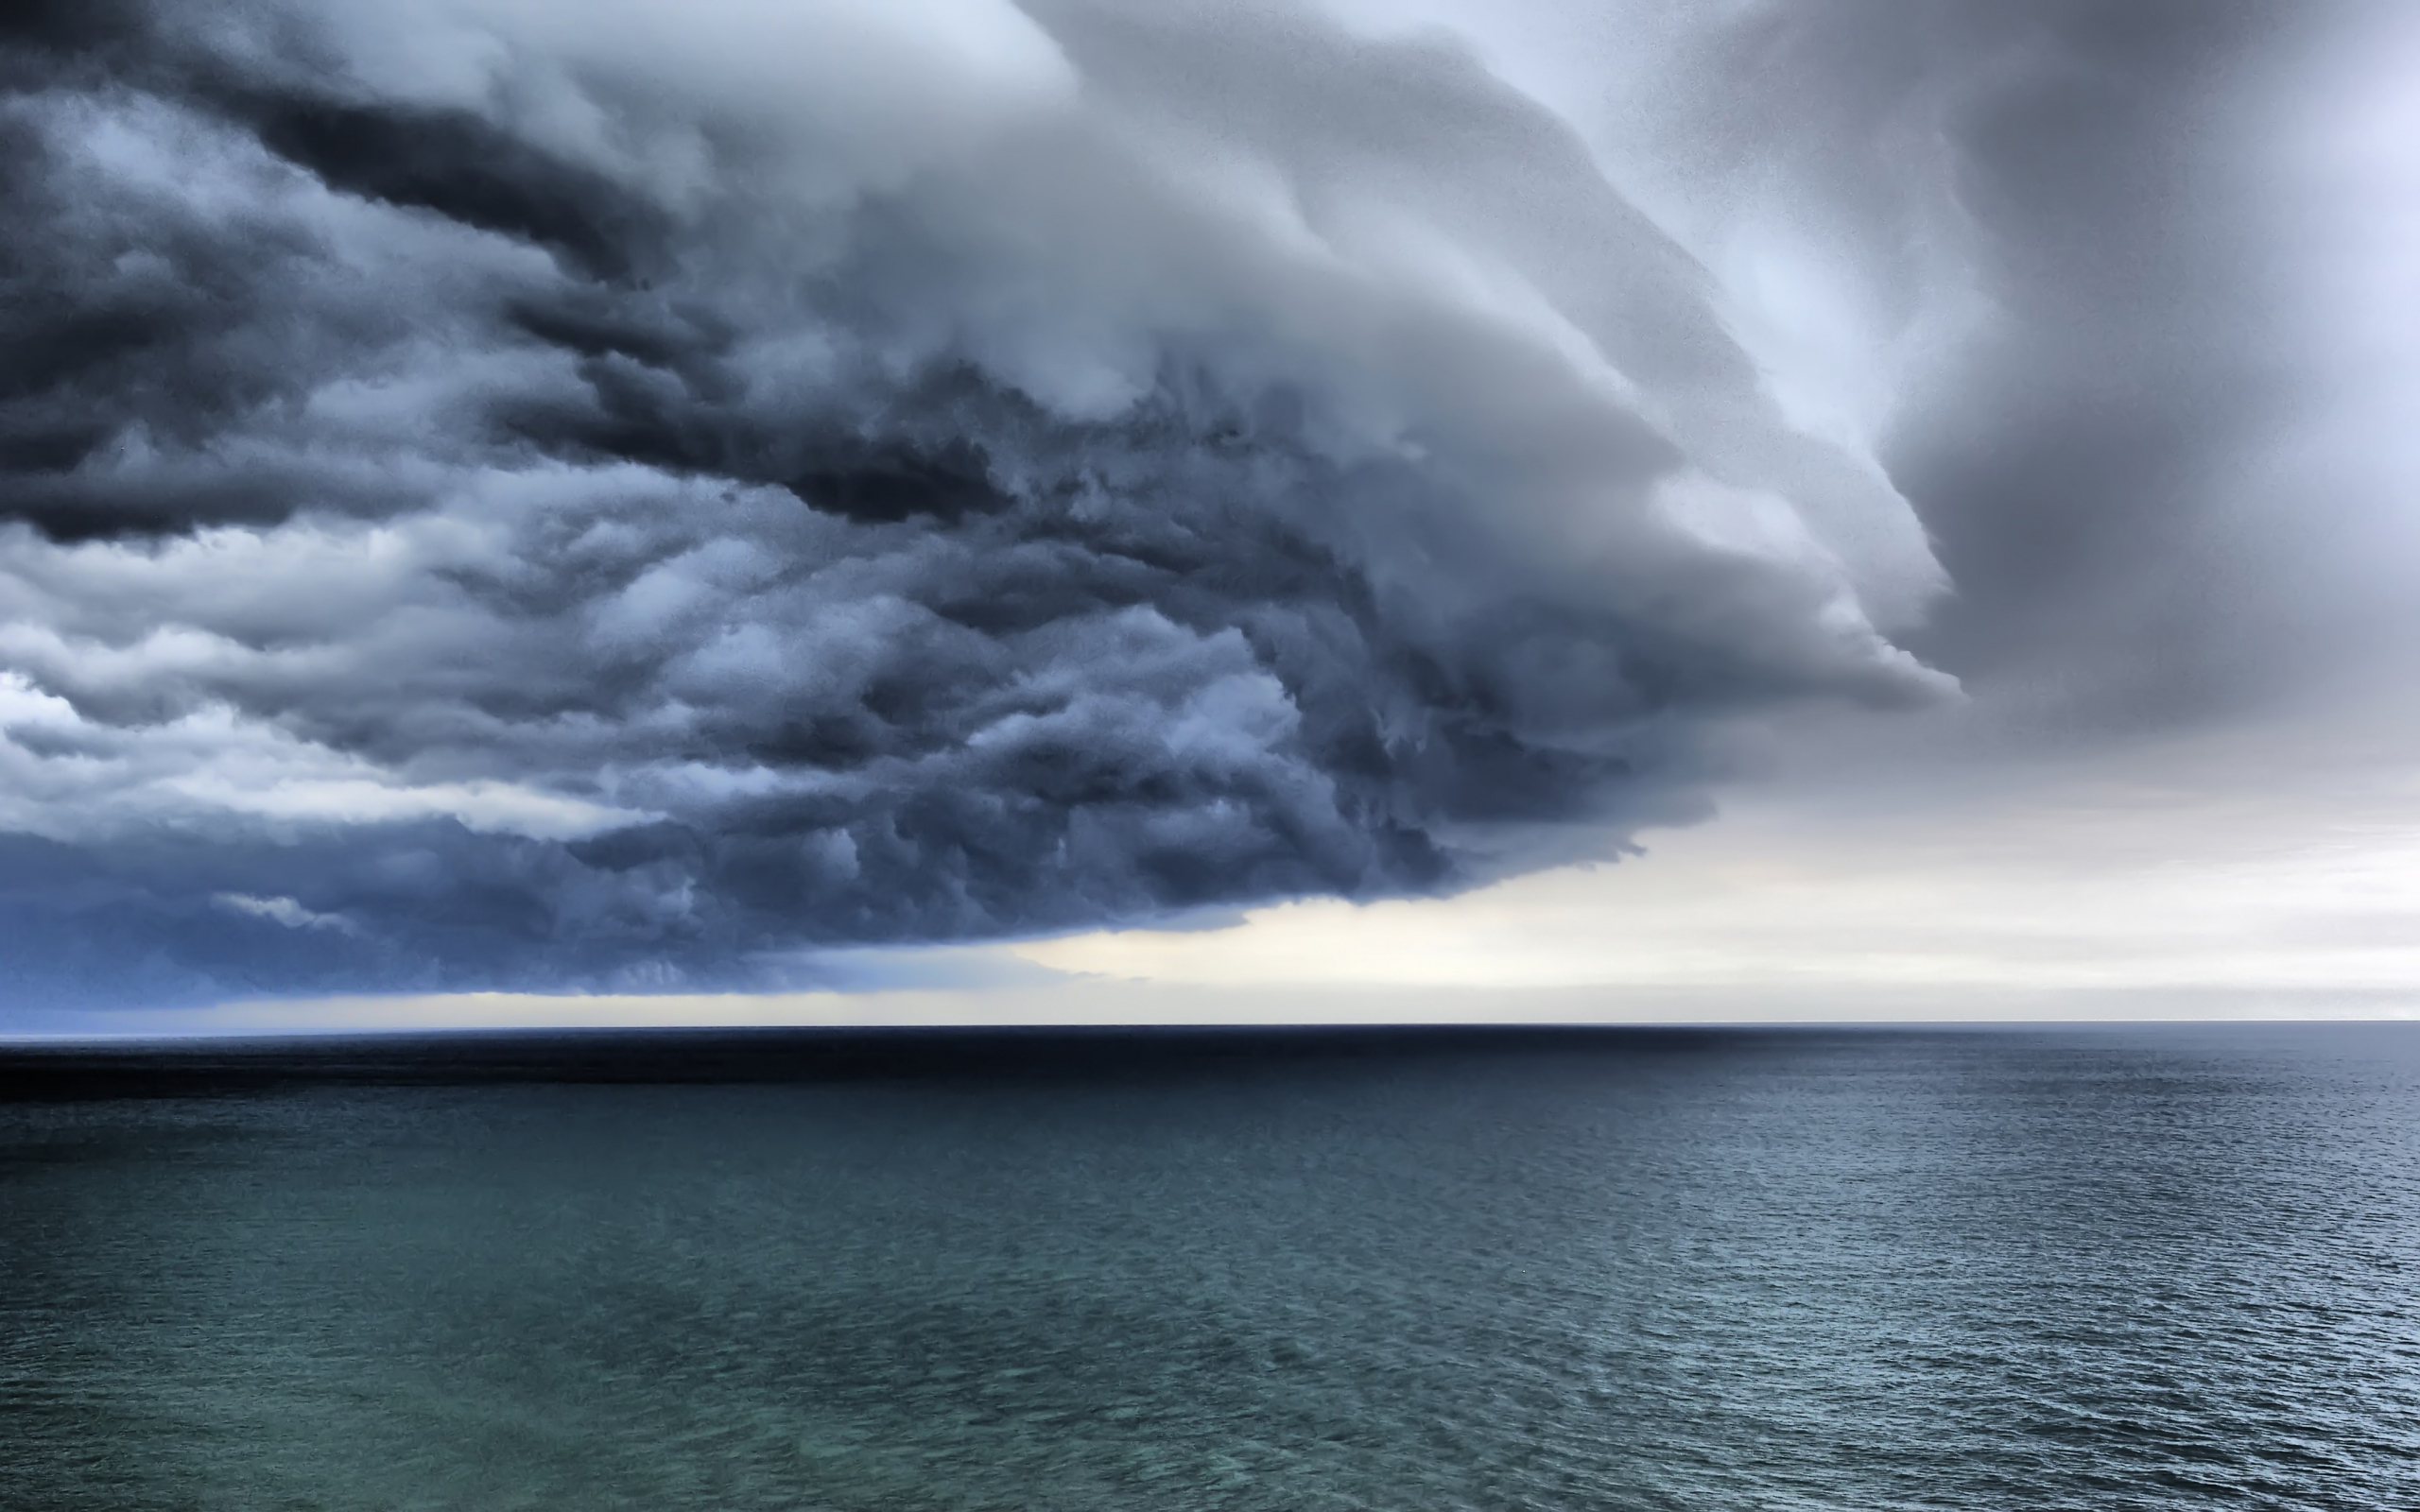 Обои картинки фото море океан облака